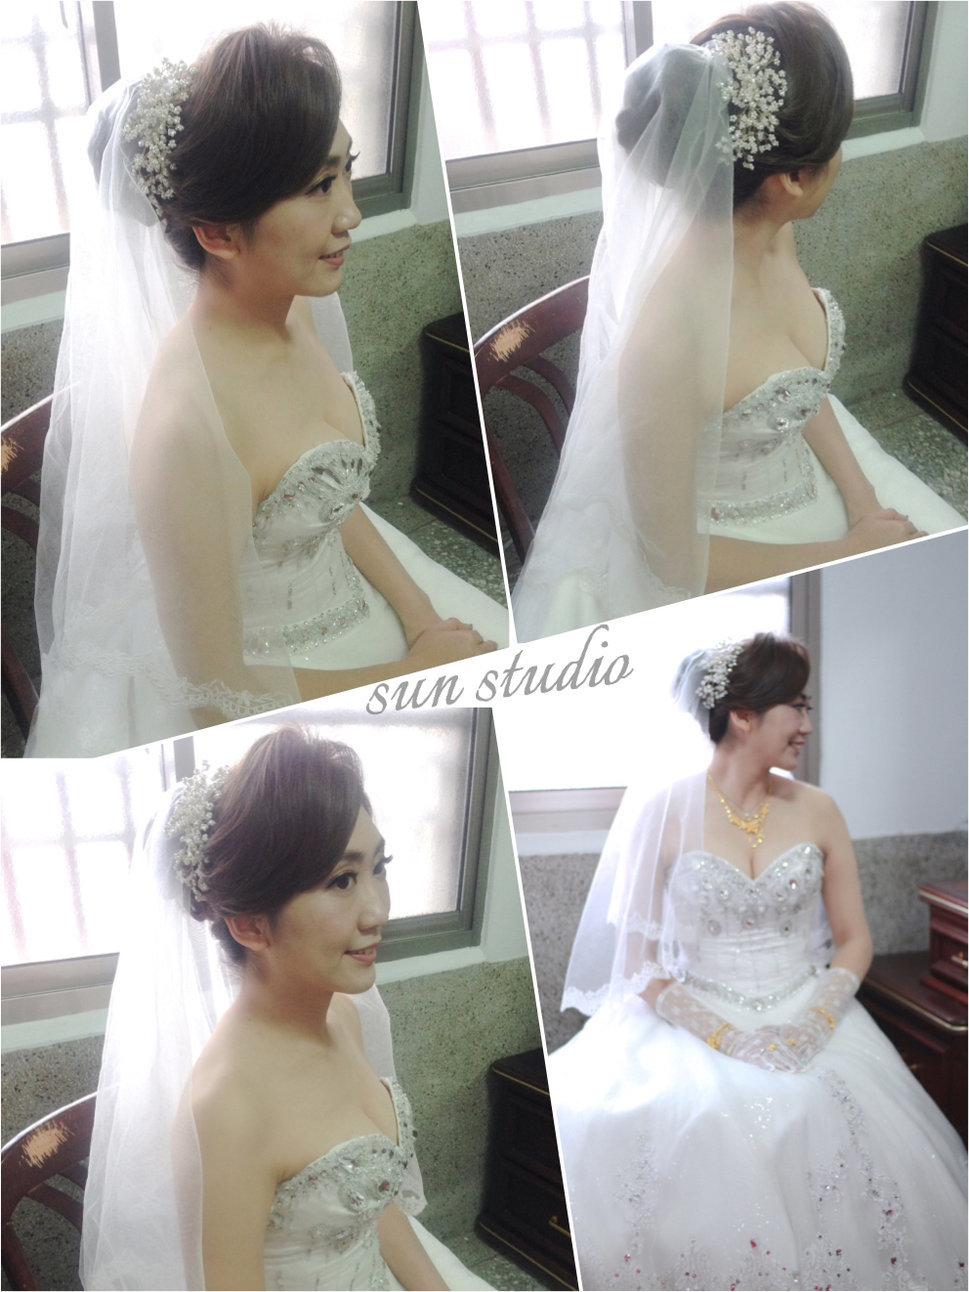 【SUN Studio新娘秘書】婚宴造型-小葵(編號:428344) - SUN Studio-珊珊 新娘秘書 - 結婚吧一站式婚禮服務平台